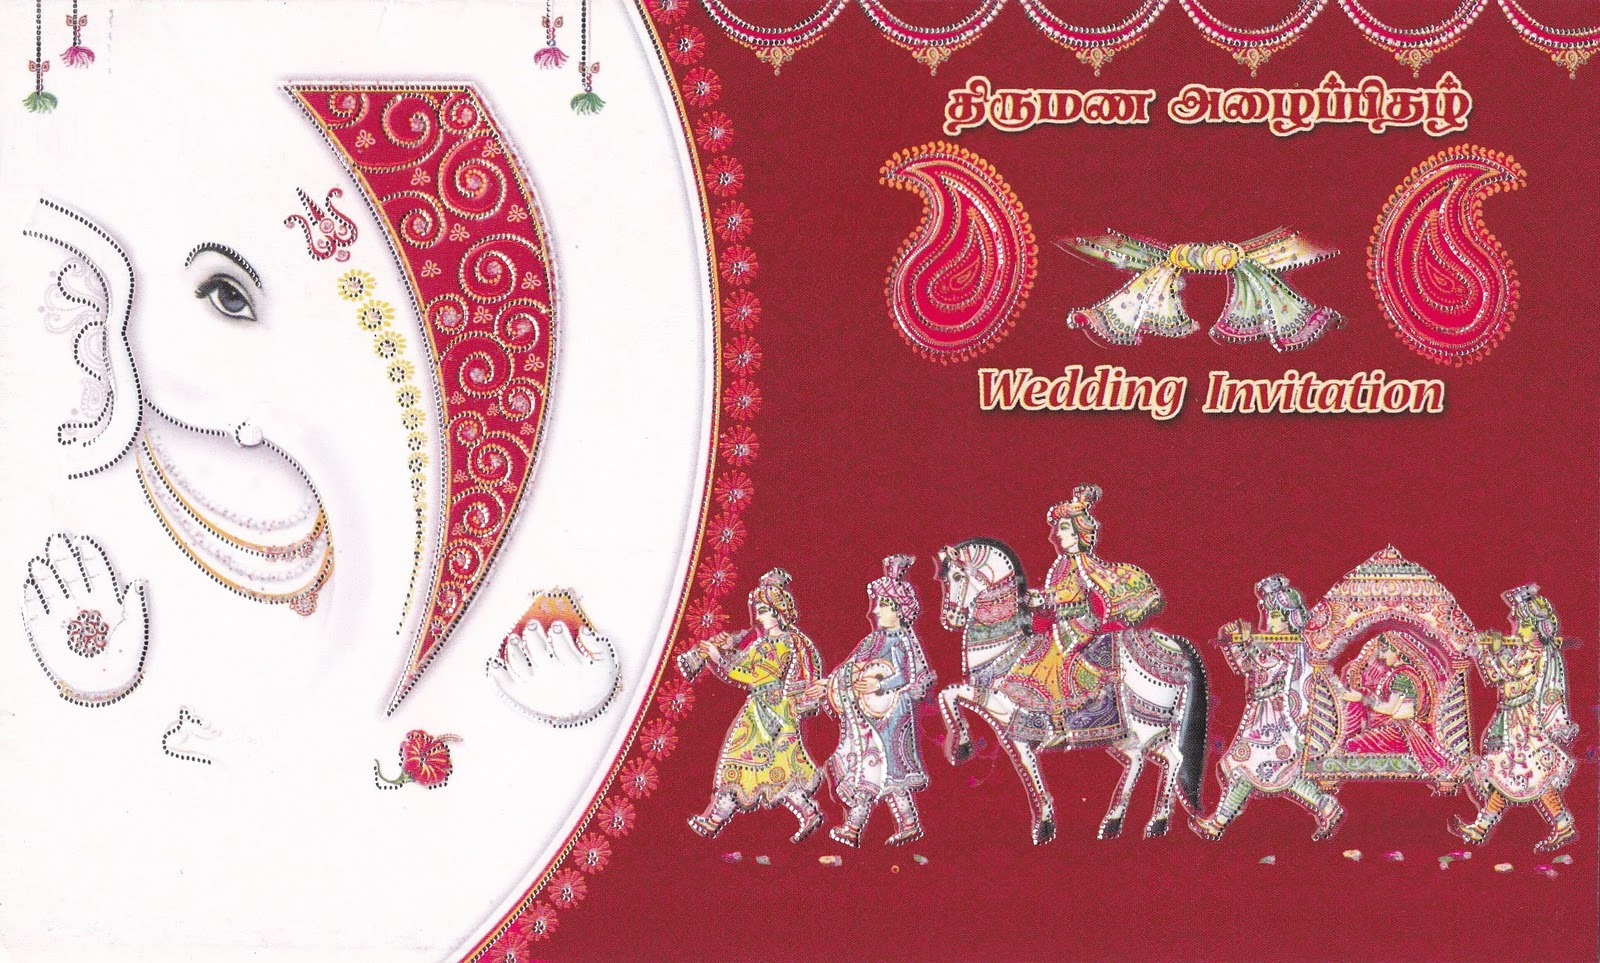 Wedding cards printers Karachi  Al Ahmed Pakistan Wedding Cards Supplier Manufacturers